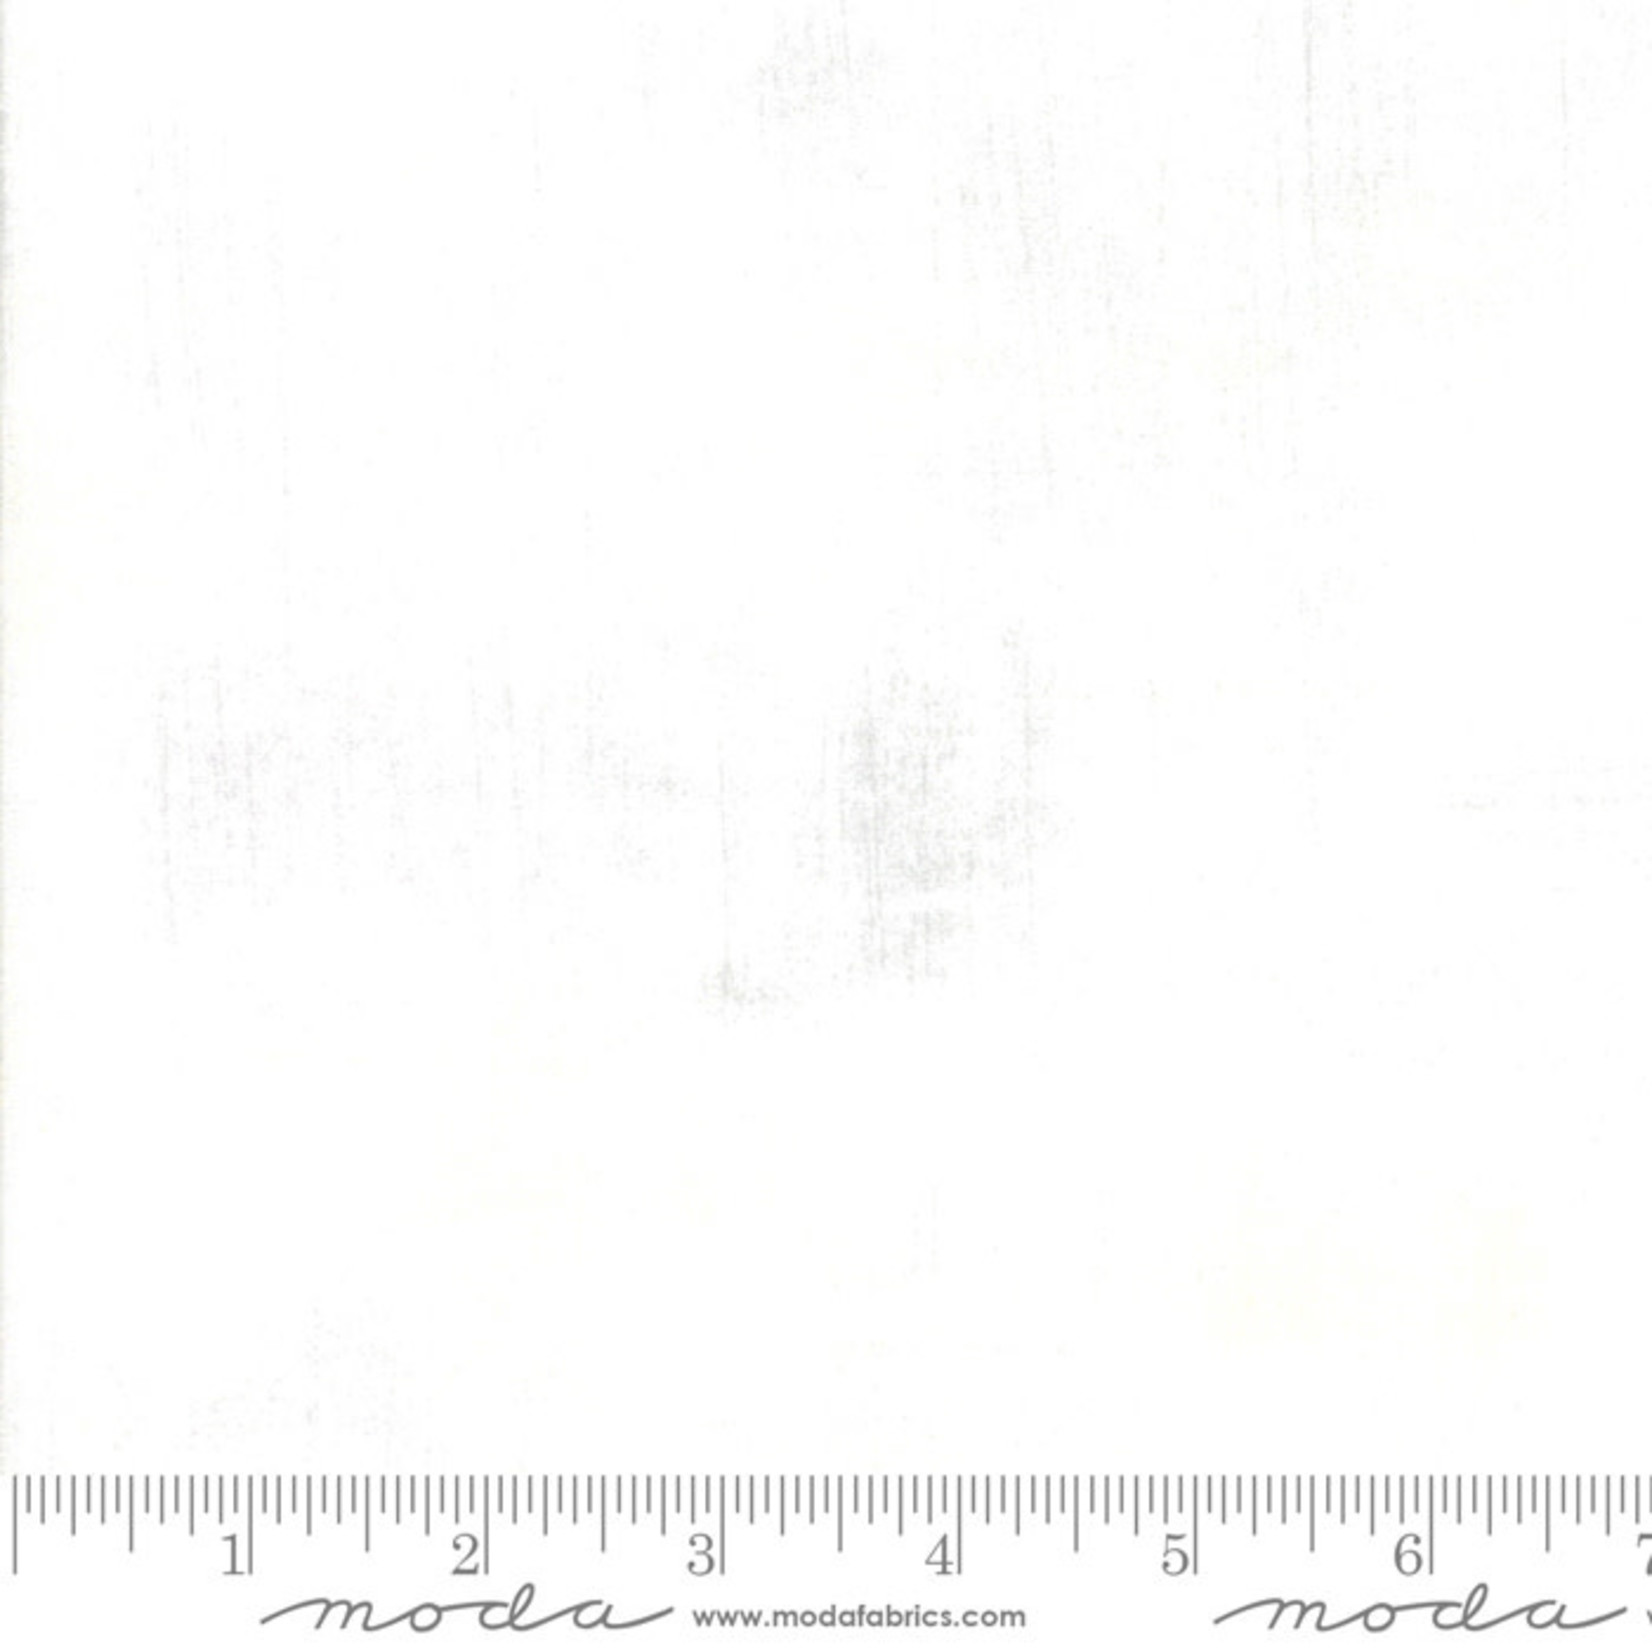 Moda GRUNGE BASICS Grunge - Soft Clear Water per cm or $20/m